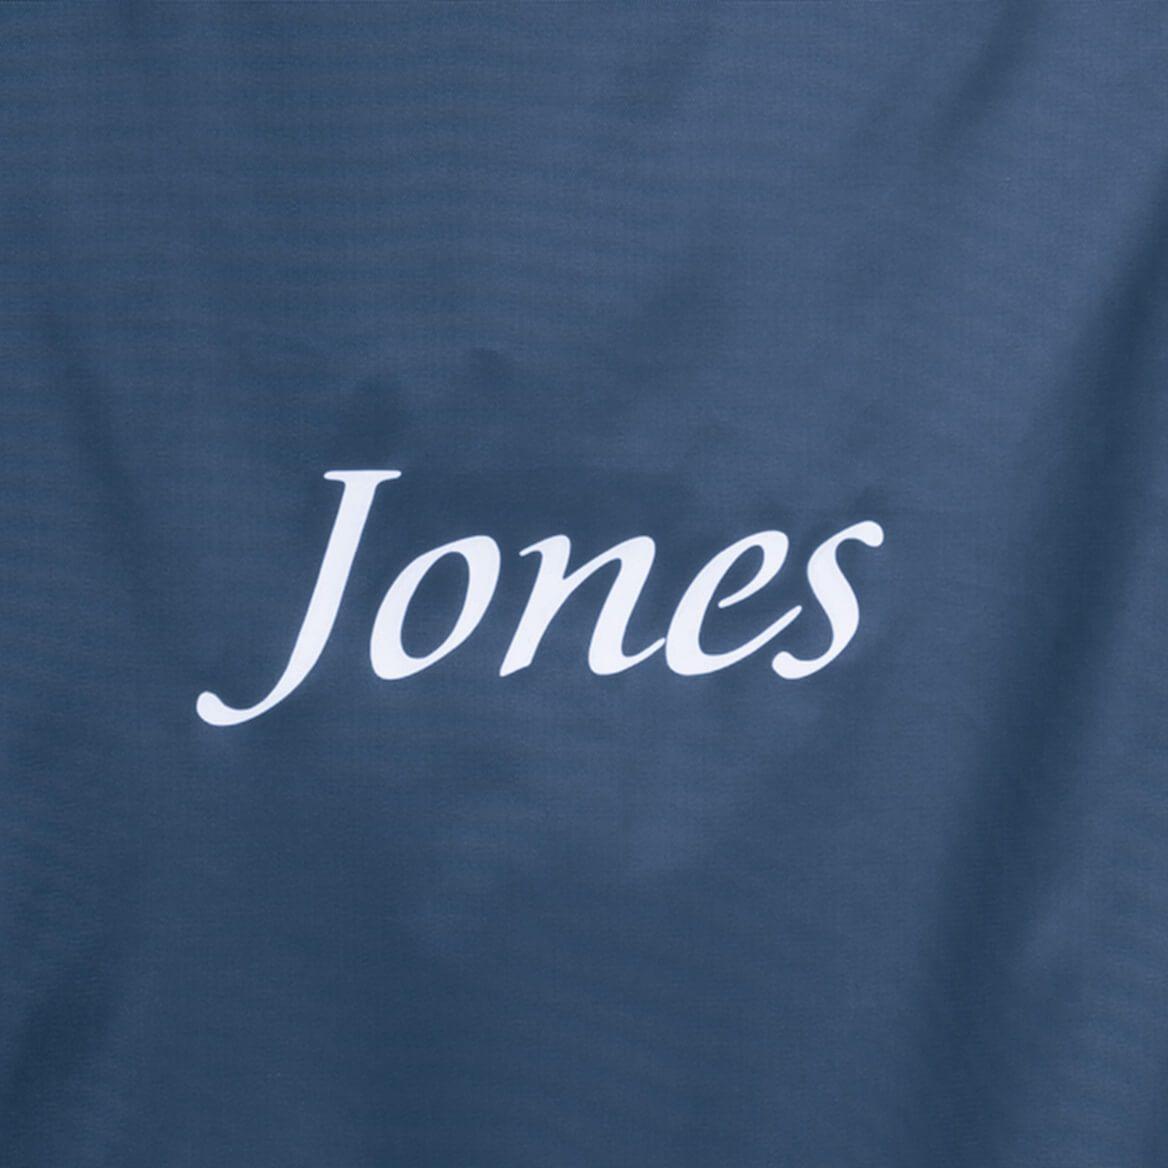 Personalized Garment Bag-303267